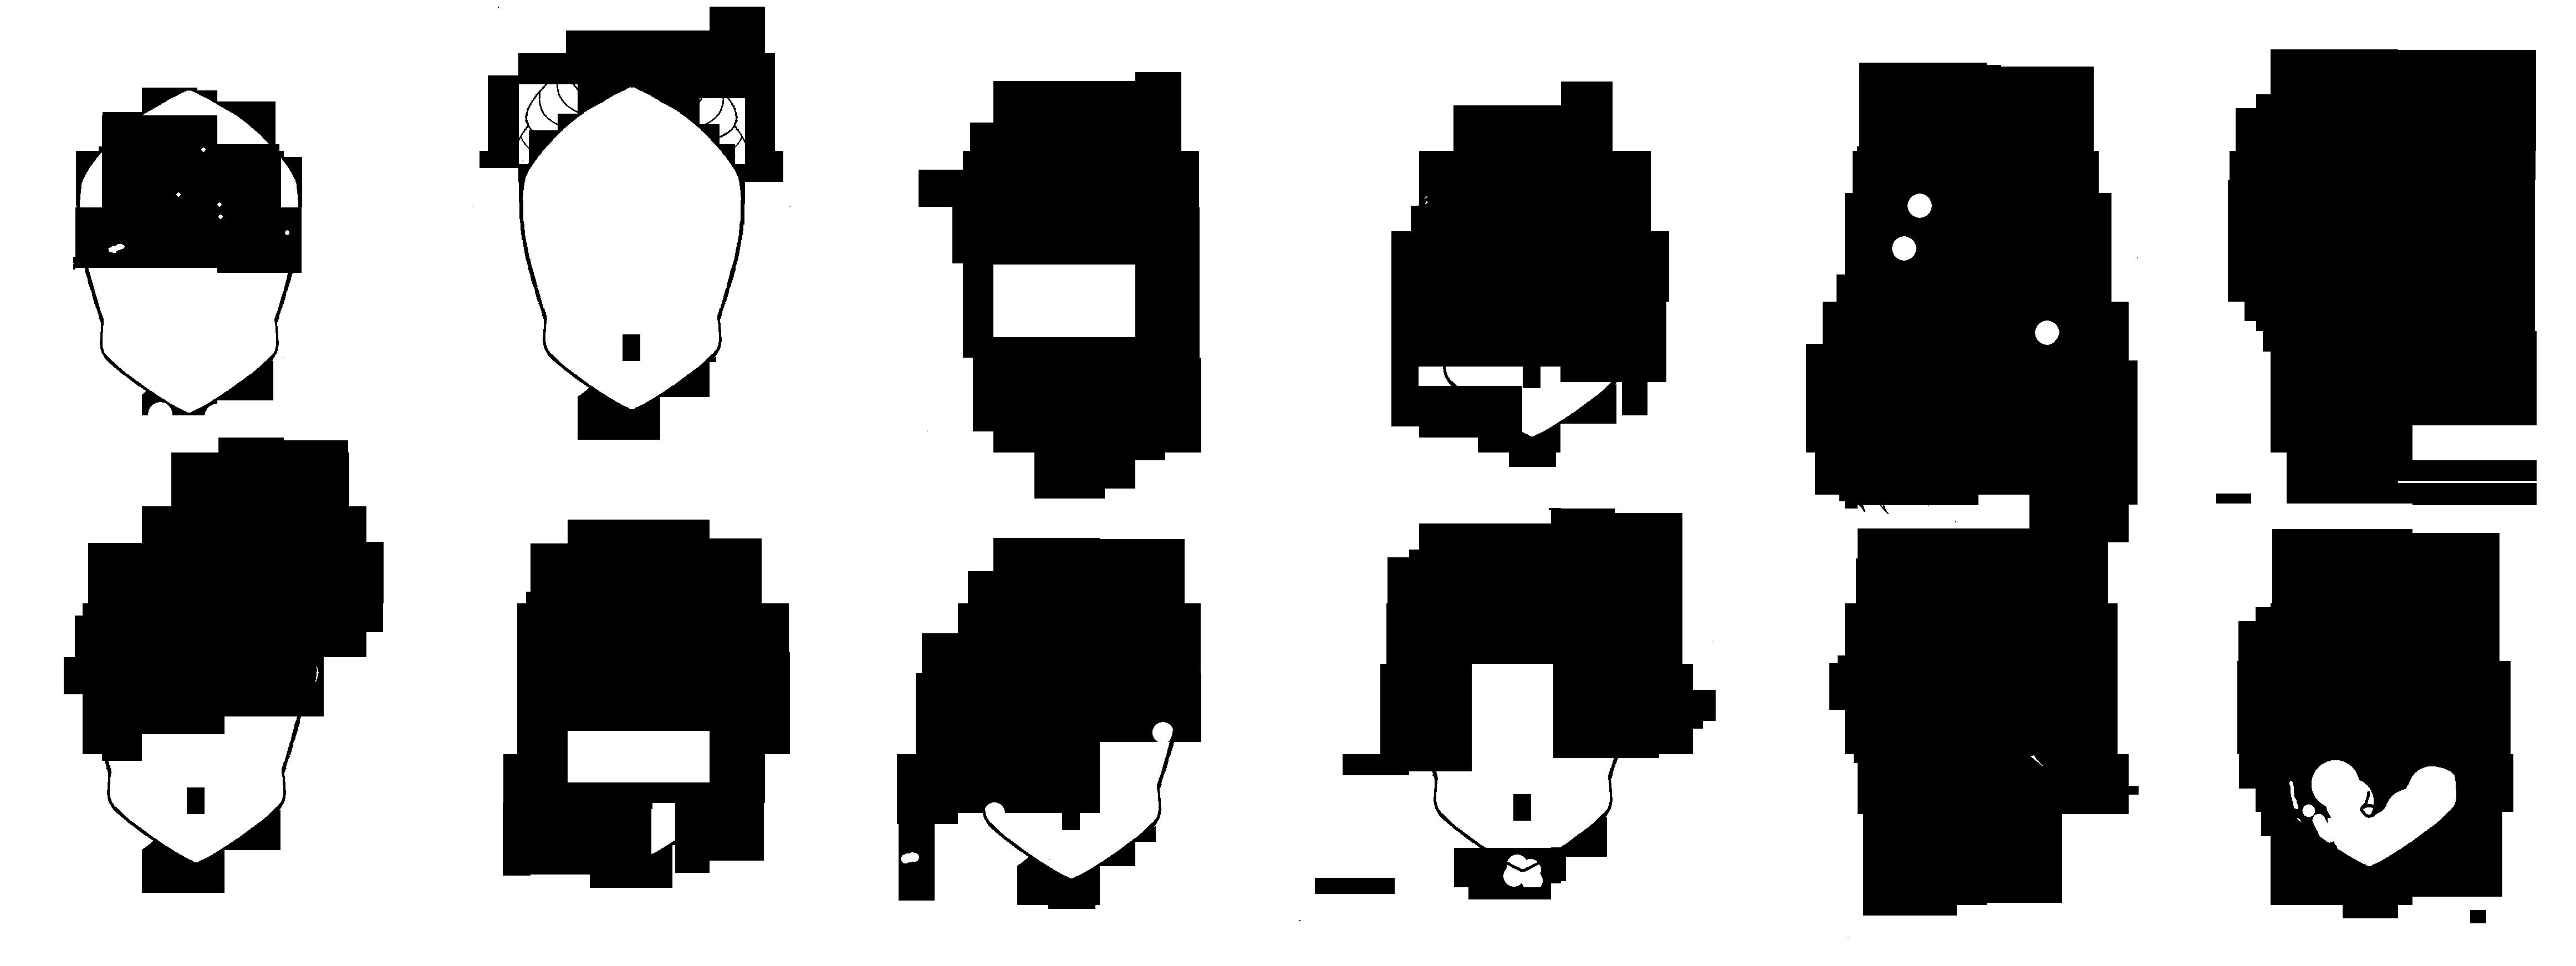 Вязание объёмного берета спицами